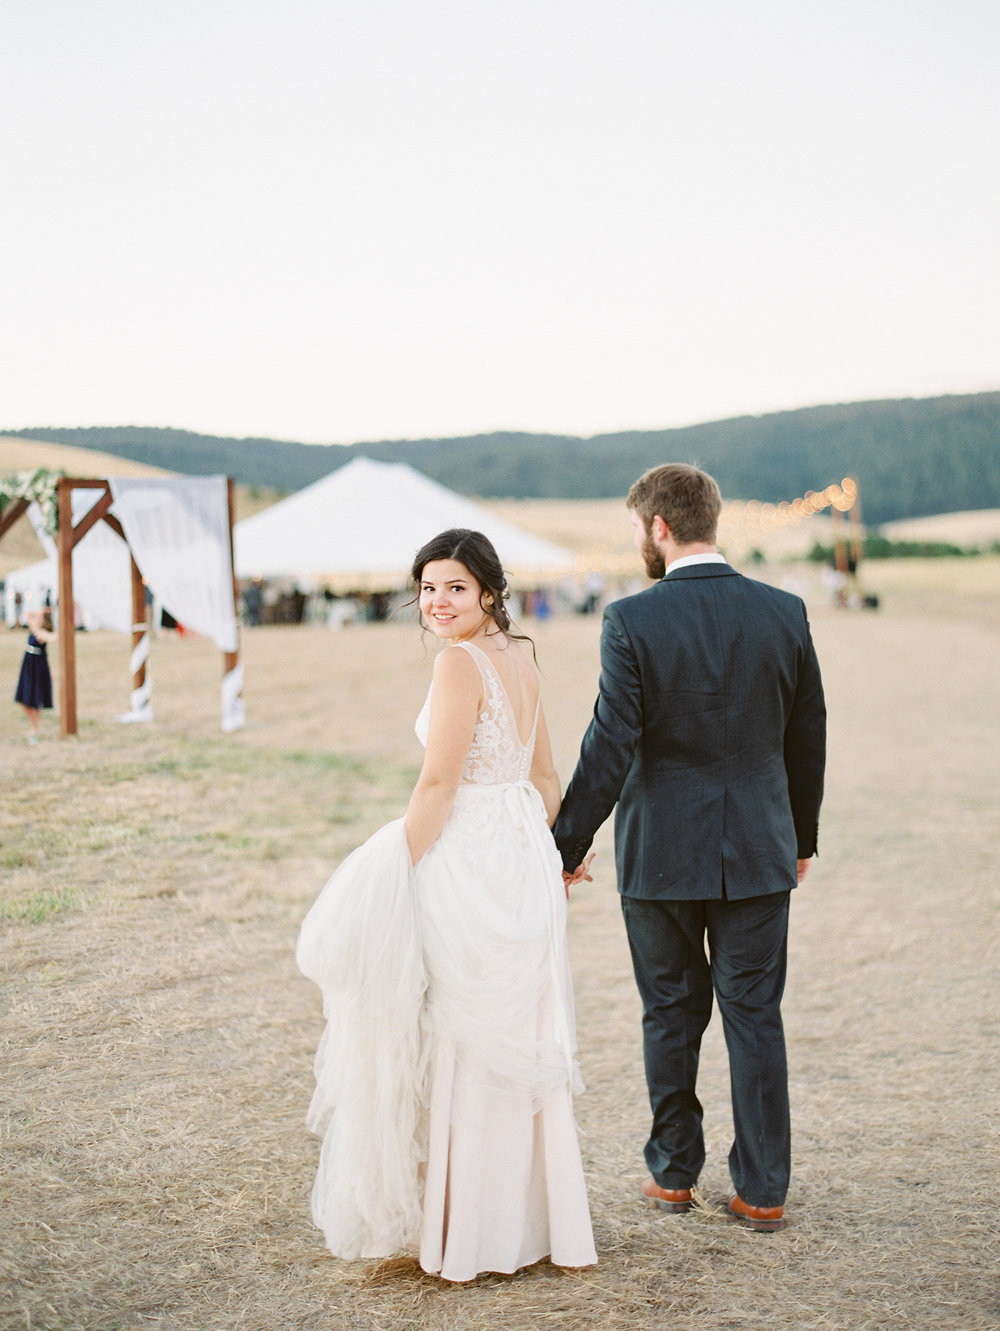 Idaho-Field-Forest-Wedding-Film-Photographer-Kristina-Adams-775 (1).jpg